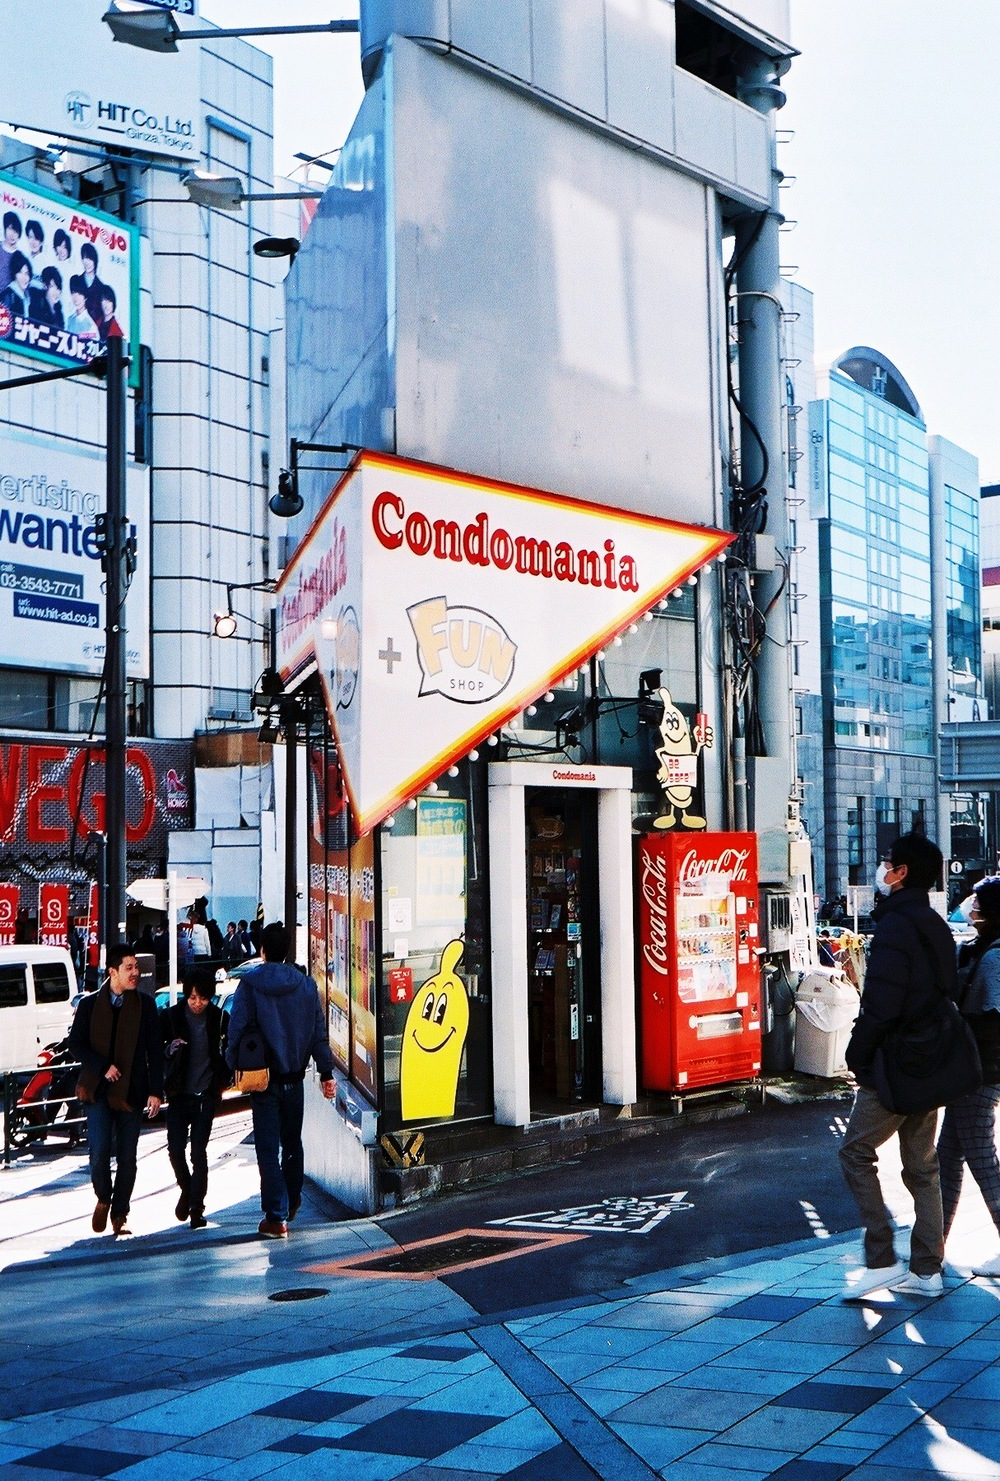 Divine Tio Condomania Harajuku Tokyo Japan - Atis Puampai